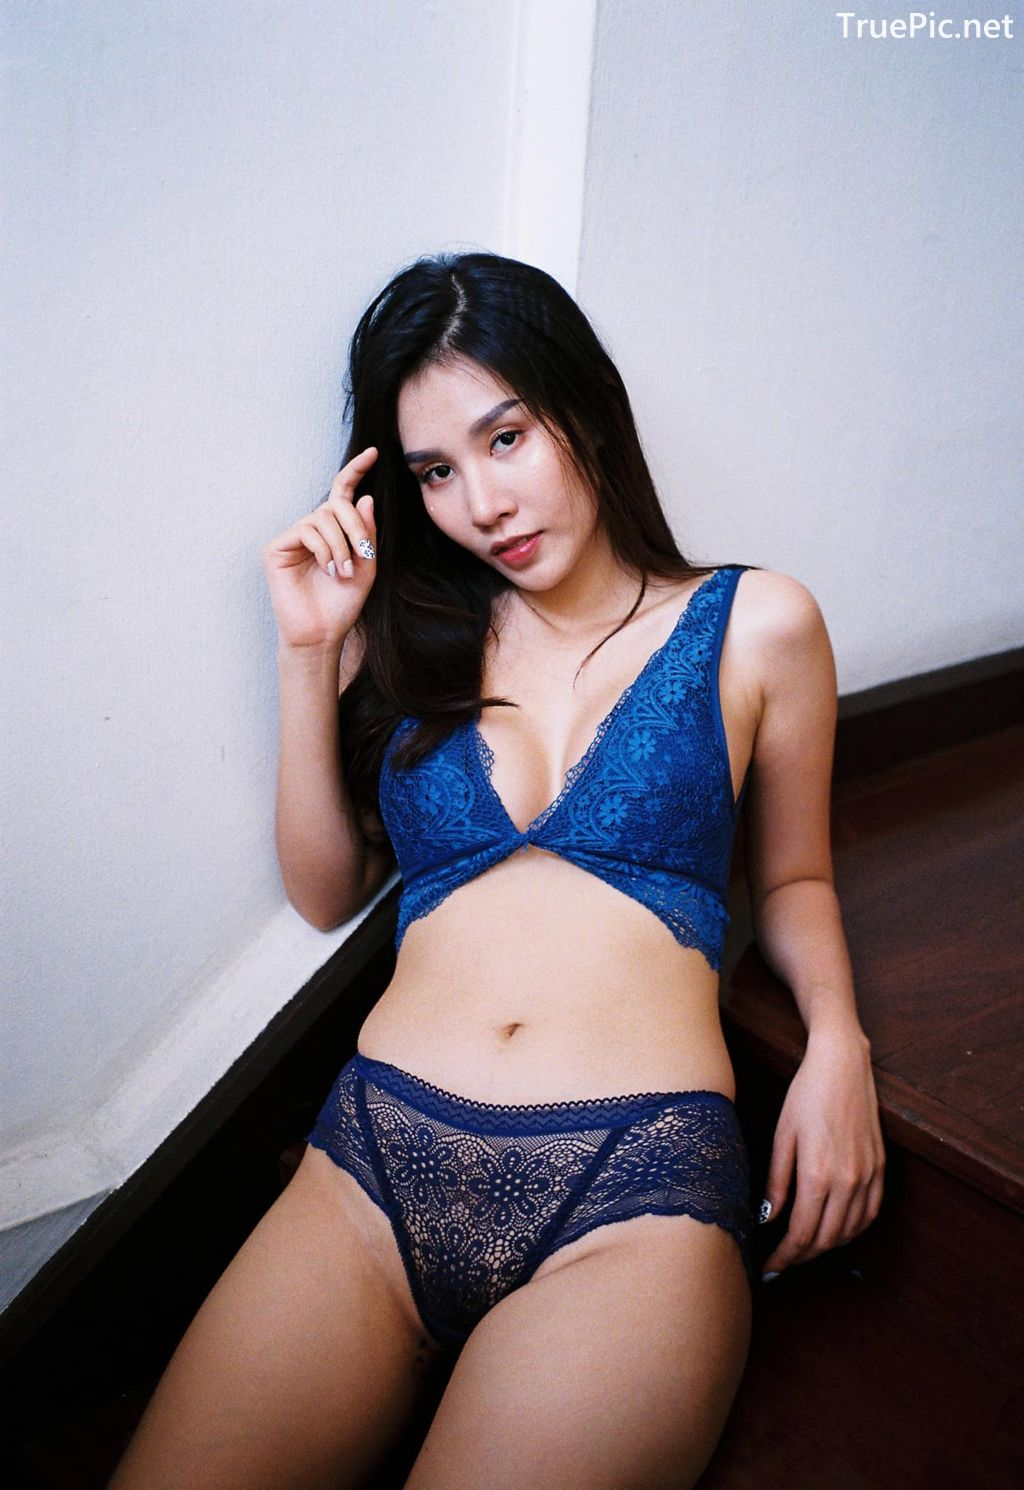 Image-Thailand-Model-Ssomch-Tanass-Blue-Lingerie-TruePic.net-TruePic.net- Picture-28